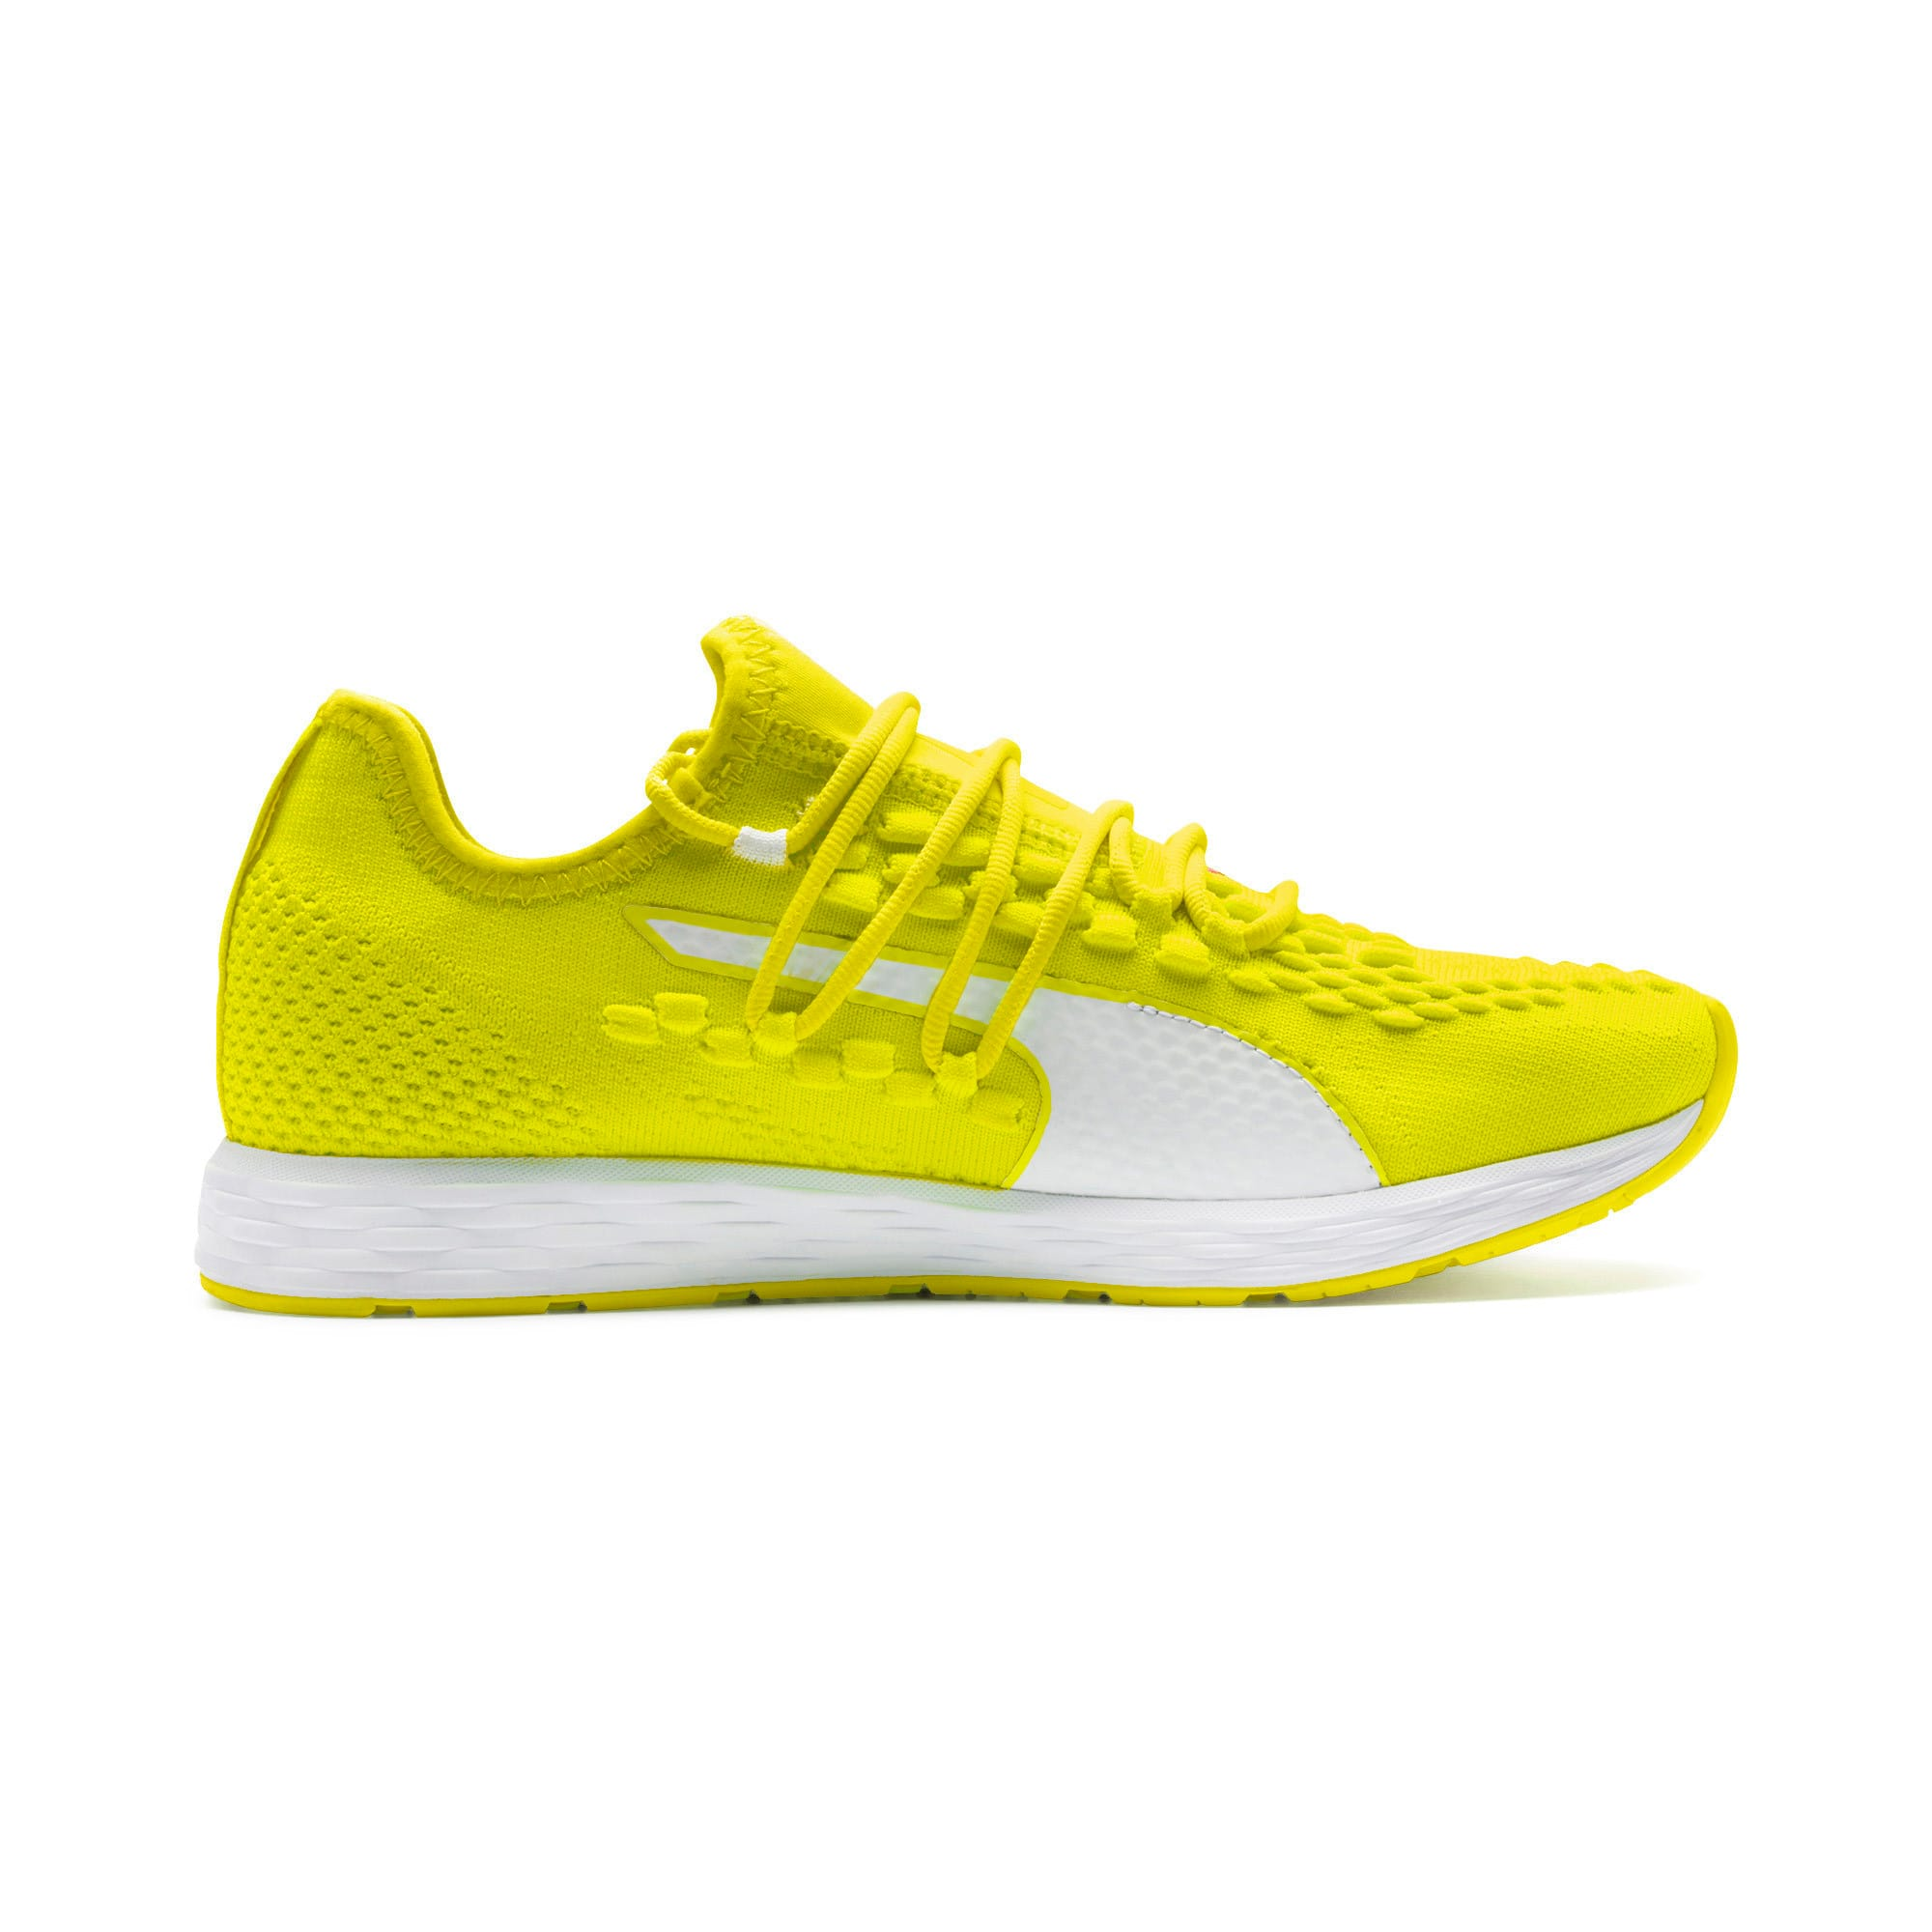 Thumbnail 7 of SPEED RACER Women's Running Shoes, Yellow-White-Pink Alert, medium-IND